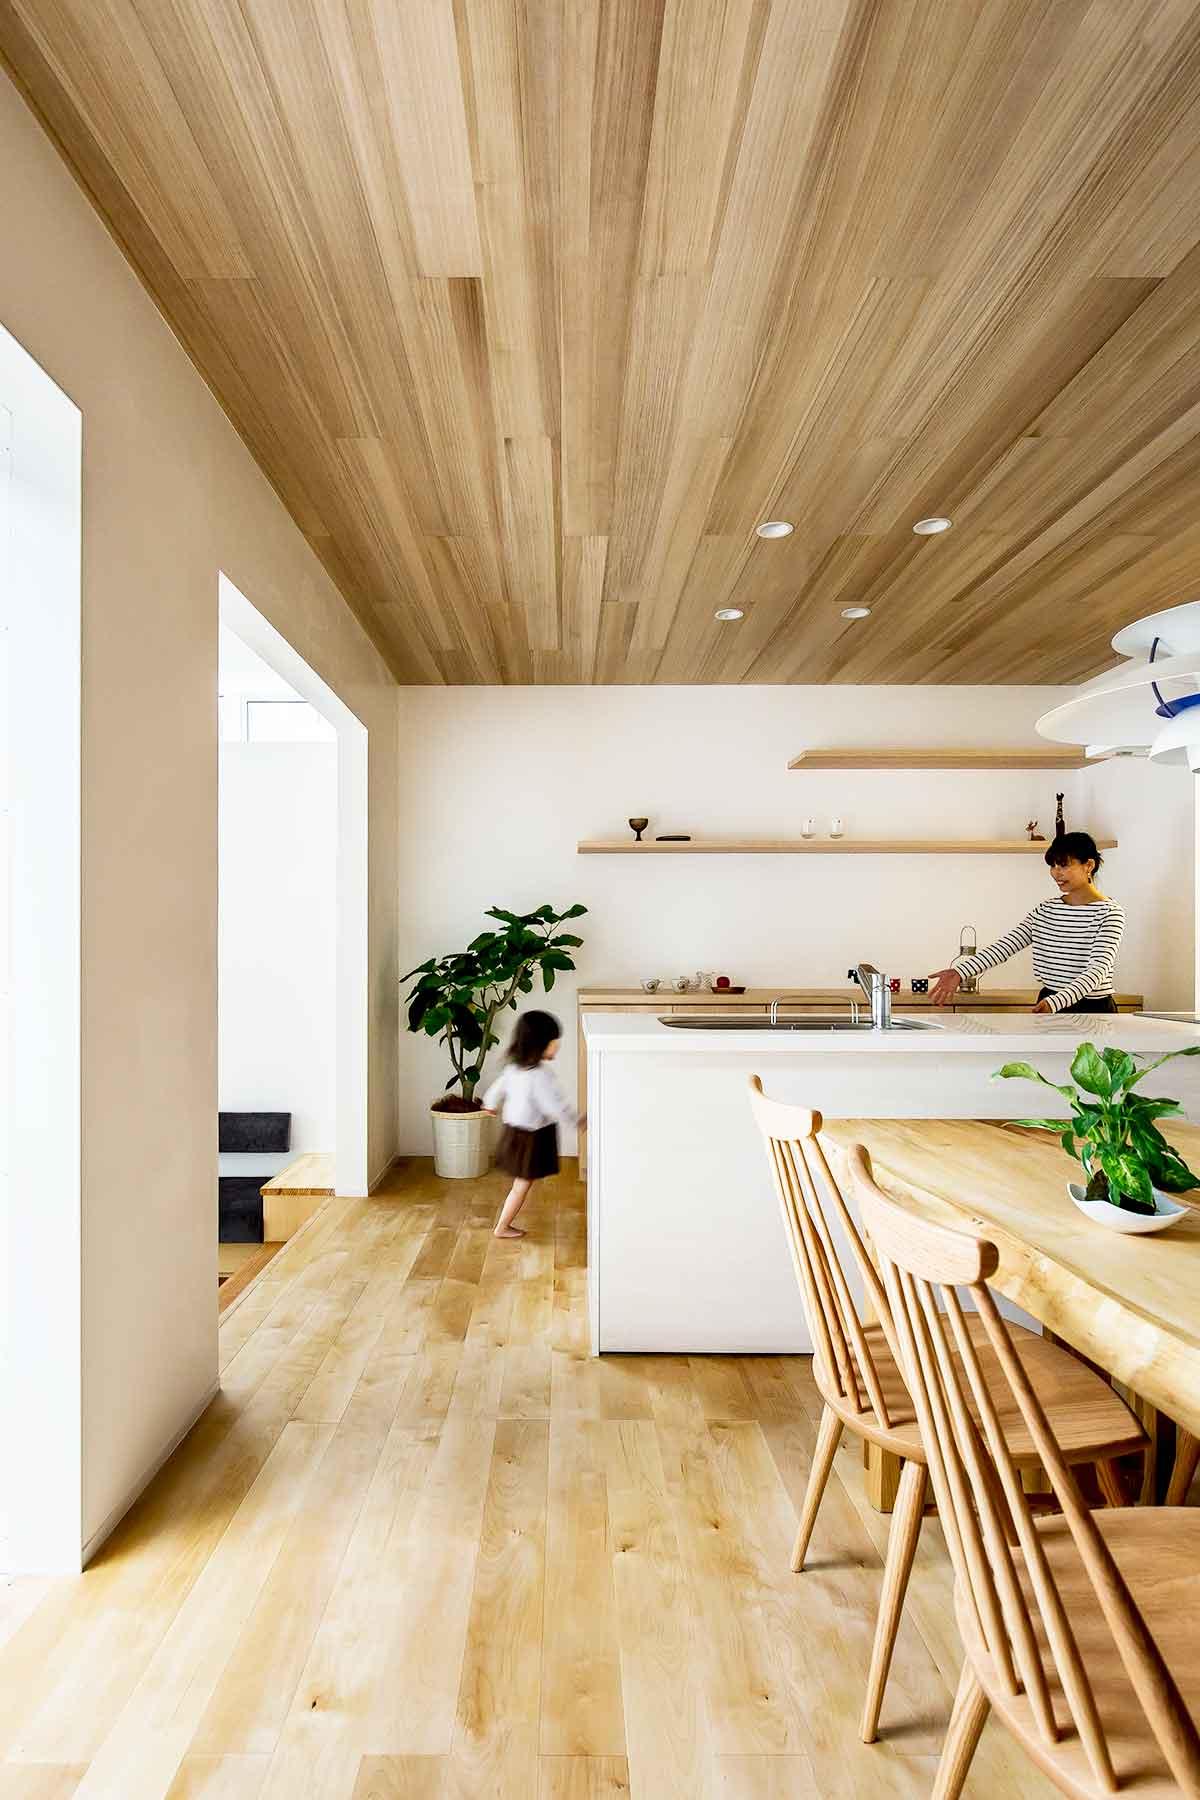 Architecture-by-Hearth-Architects,-Japan.--Photography-by-Yuta-Yamada-02.jpg